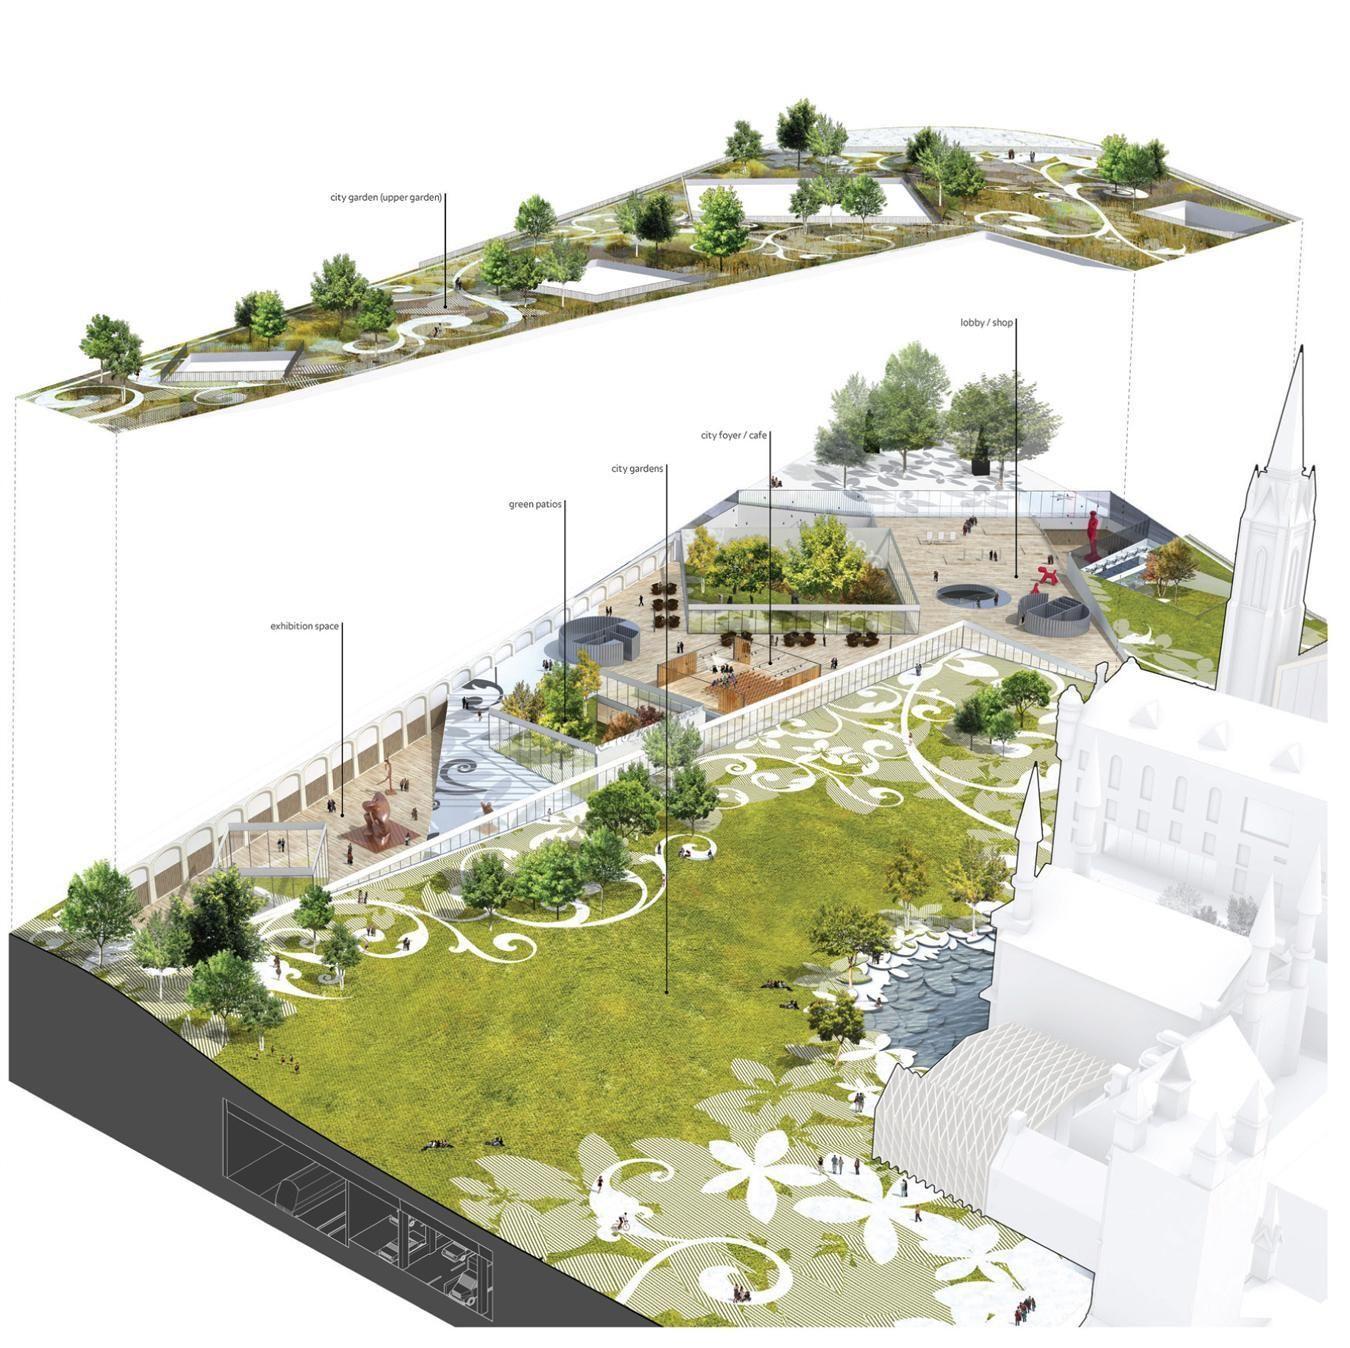 Landscape Architects: A F A S I A: Mecanoo . Cooper Cromar . Ian White Landscape